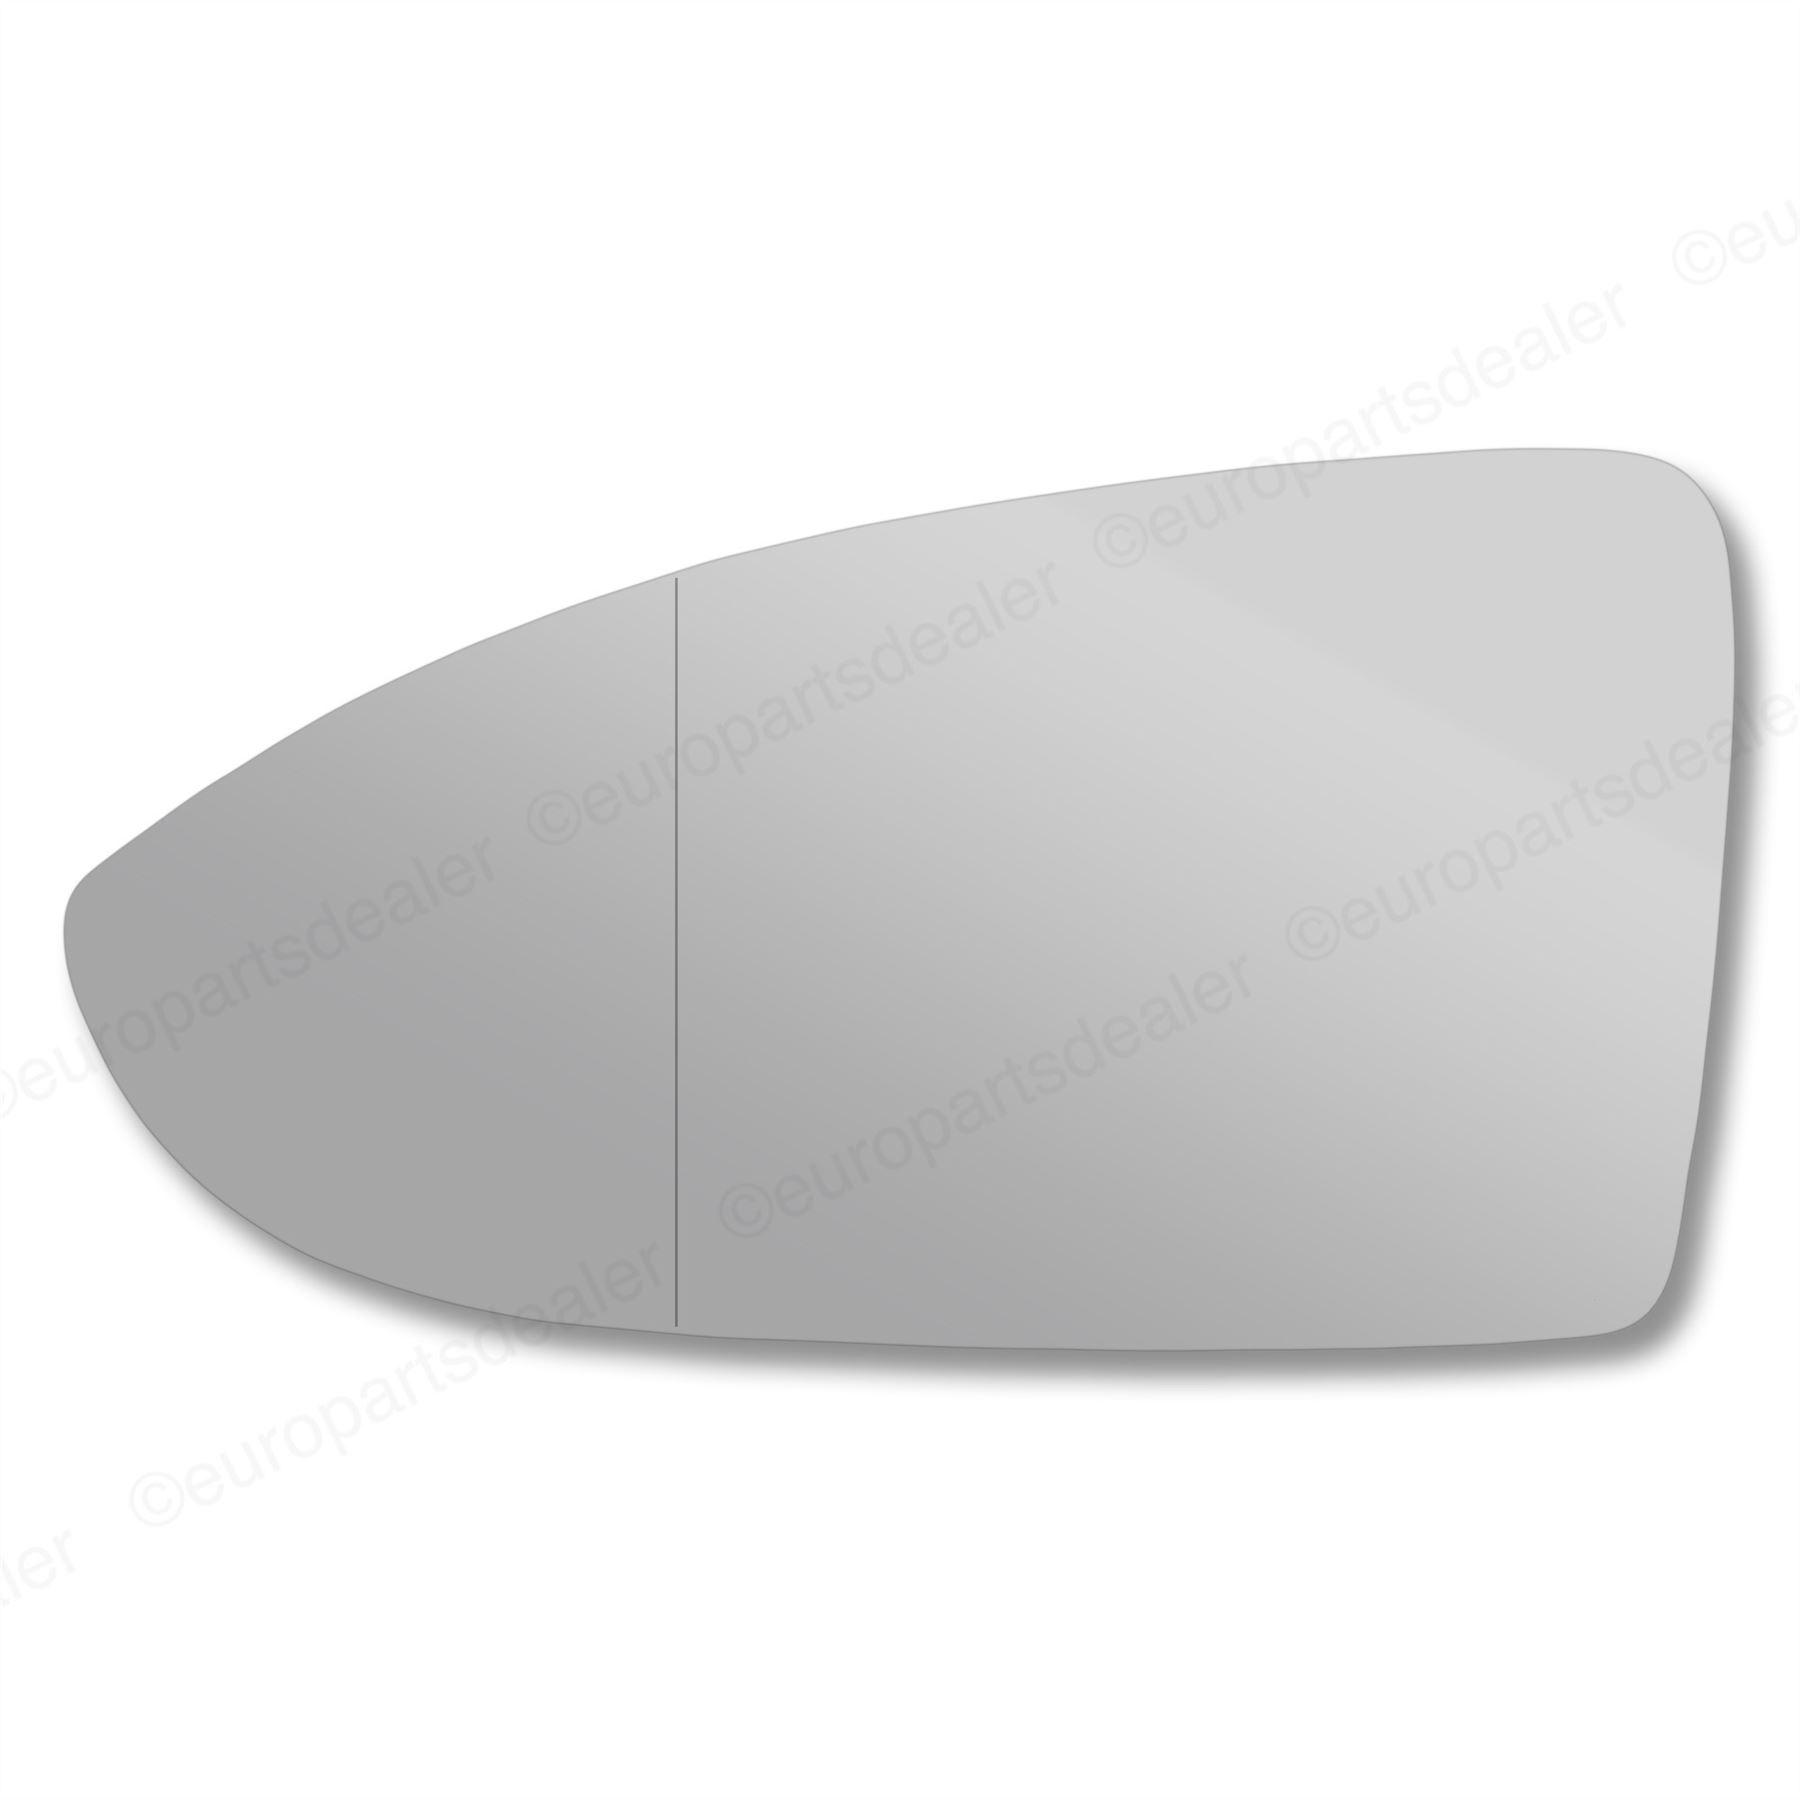 AD 2001 to 2008 Car Door Wing Mirror Glass UK Passenger Side